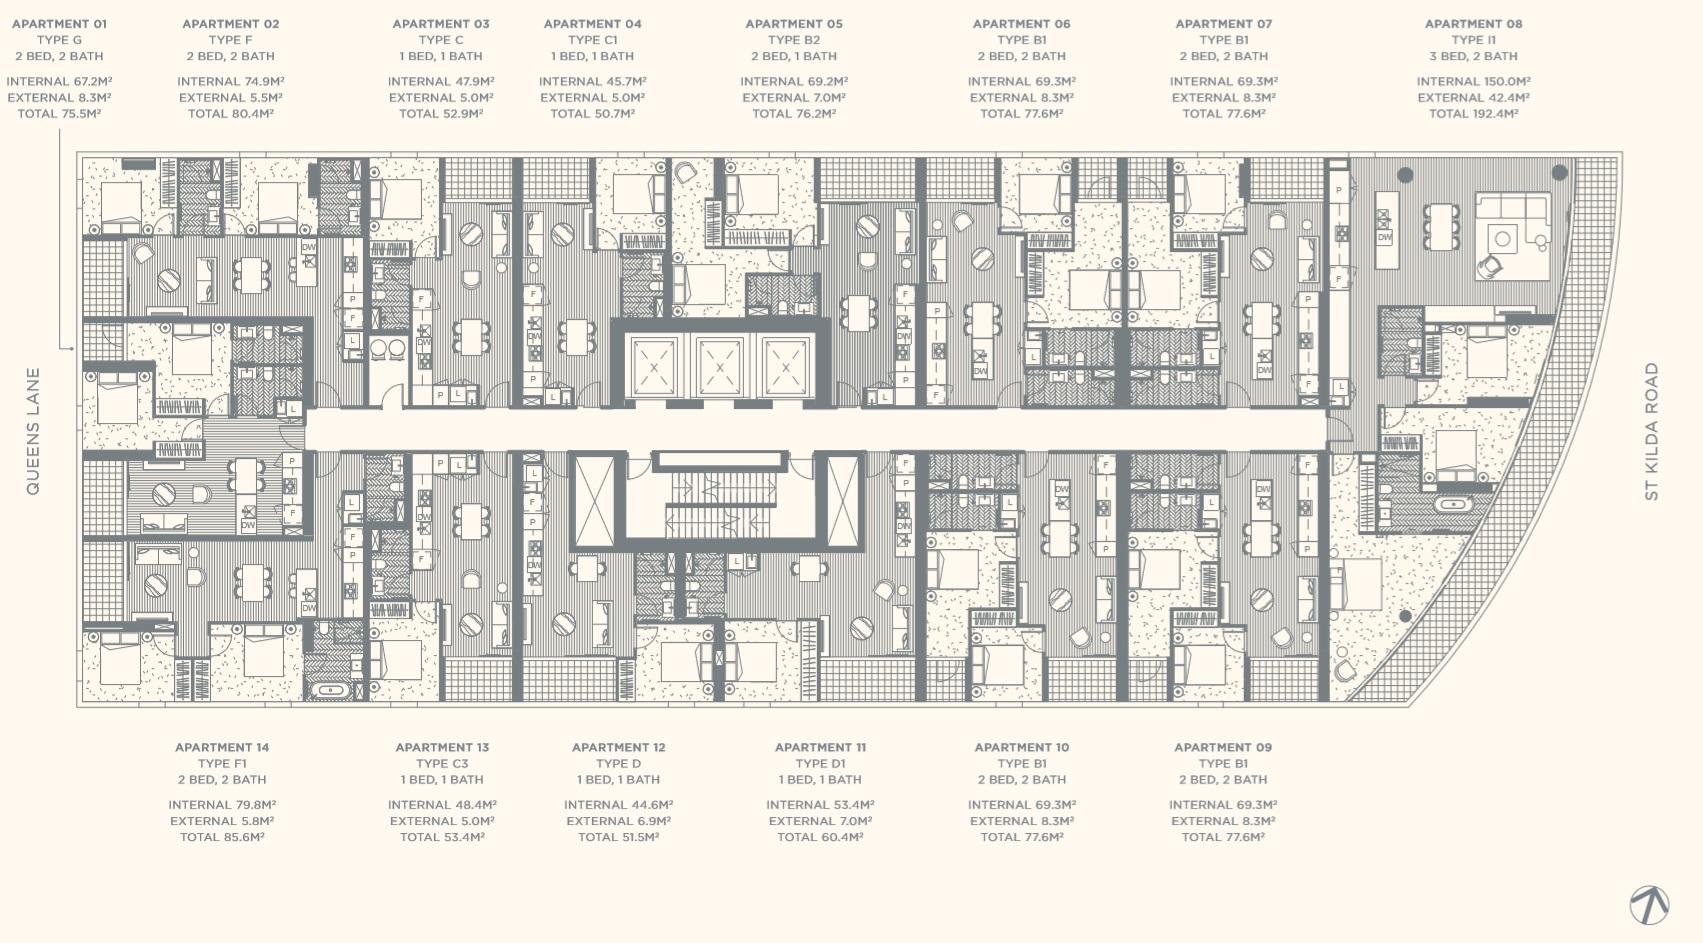 Floor Plate Level 08